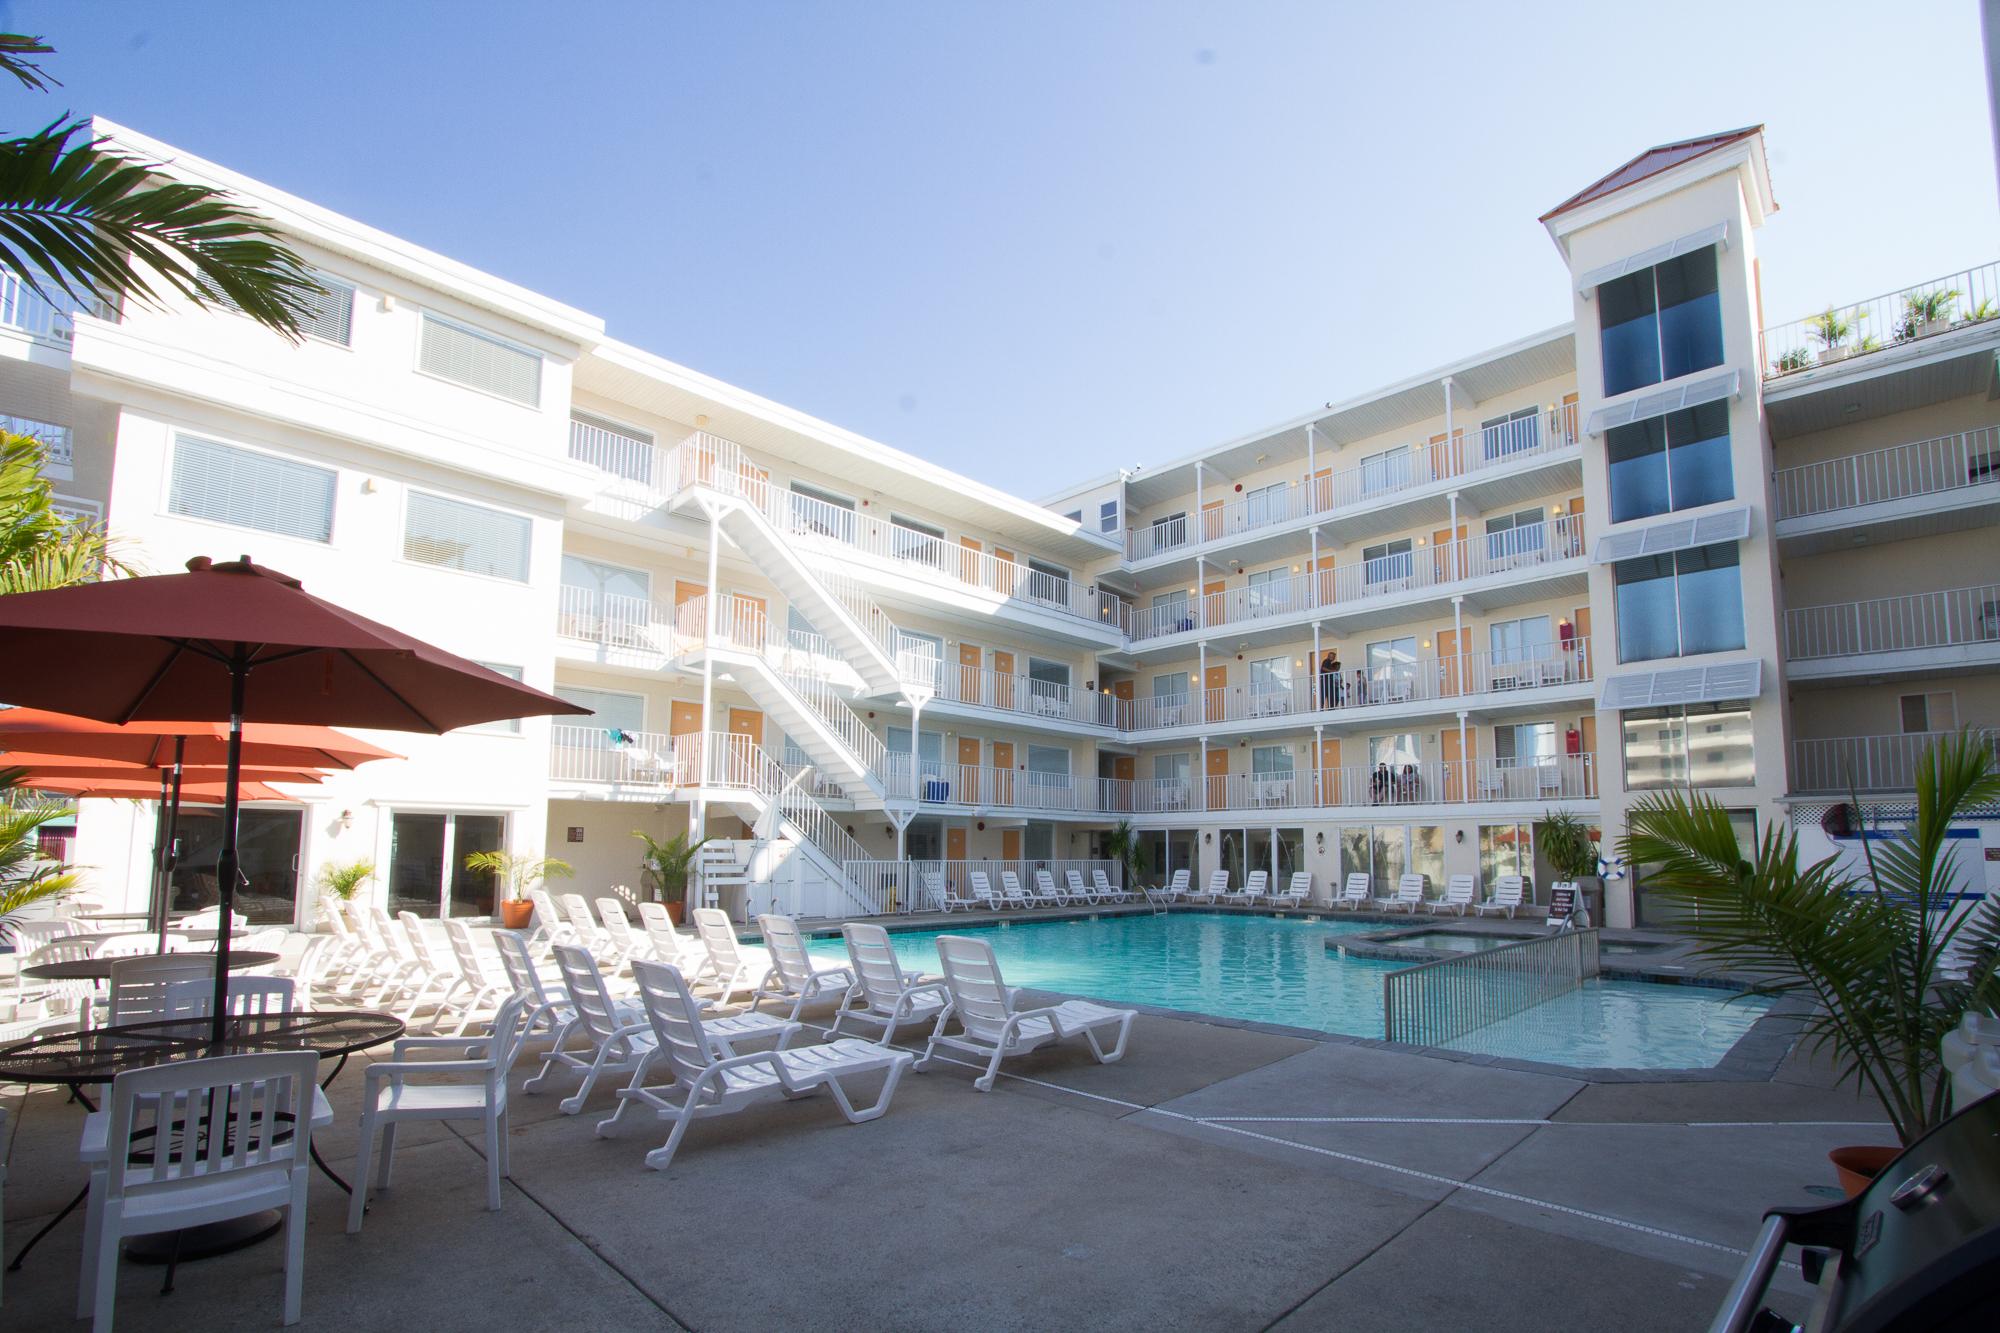 The Aqua Beach Hotel